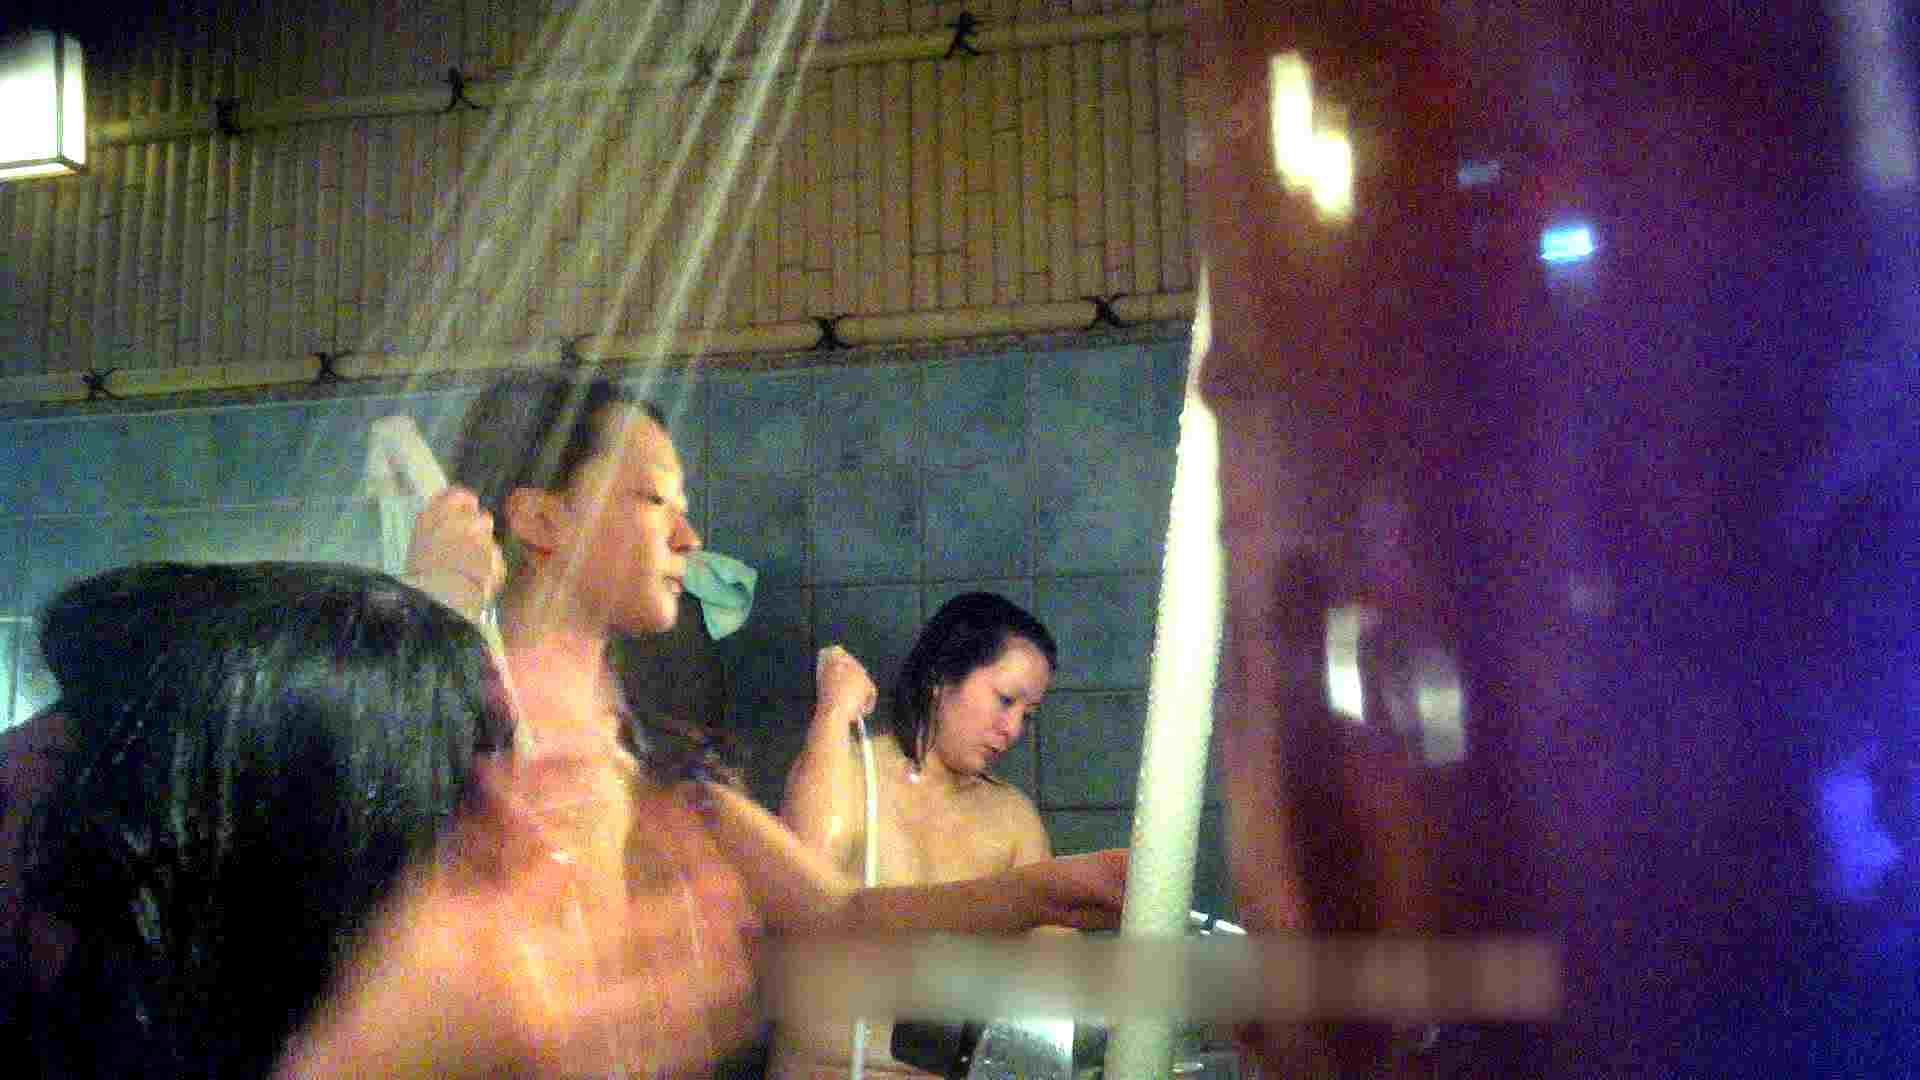 TG.12 【上等兵】いやぁ若い!ぷっちぷちギャル!でも時間短い・・・ 潜入   女風呂  67pic 40